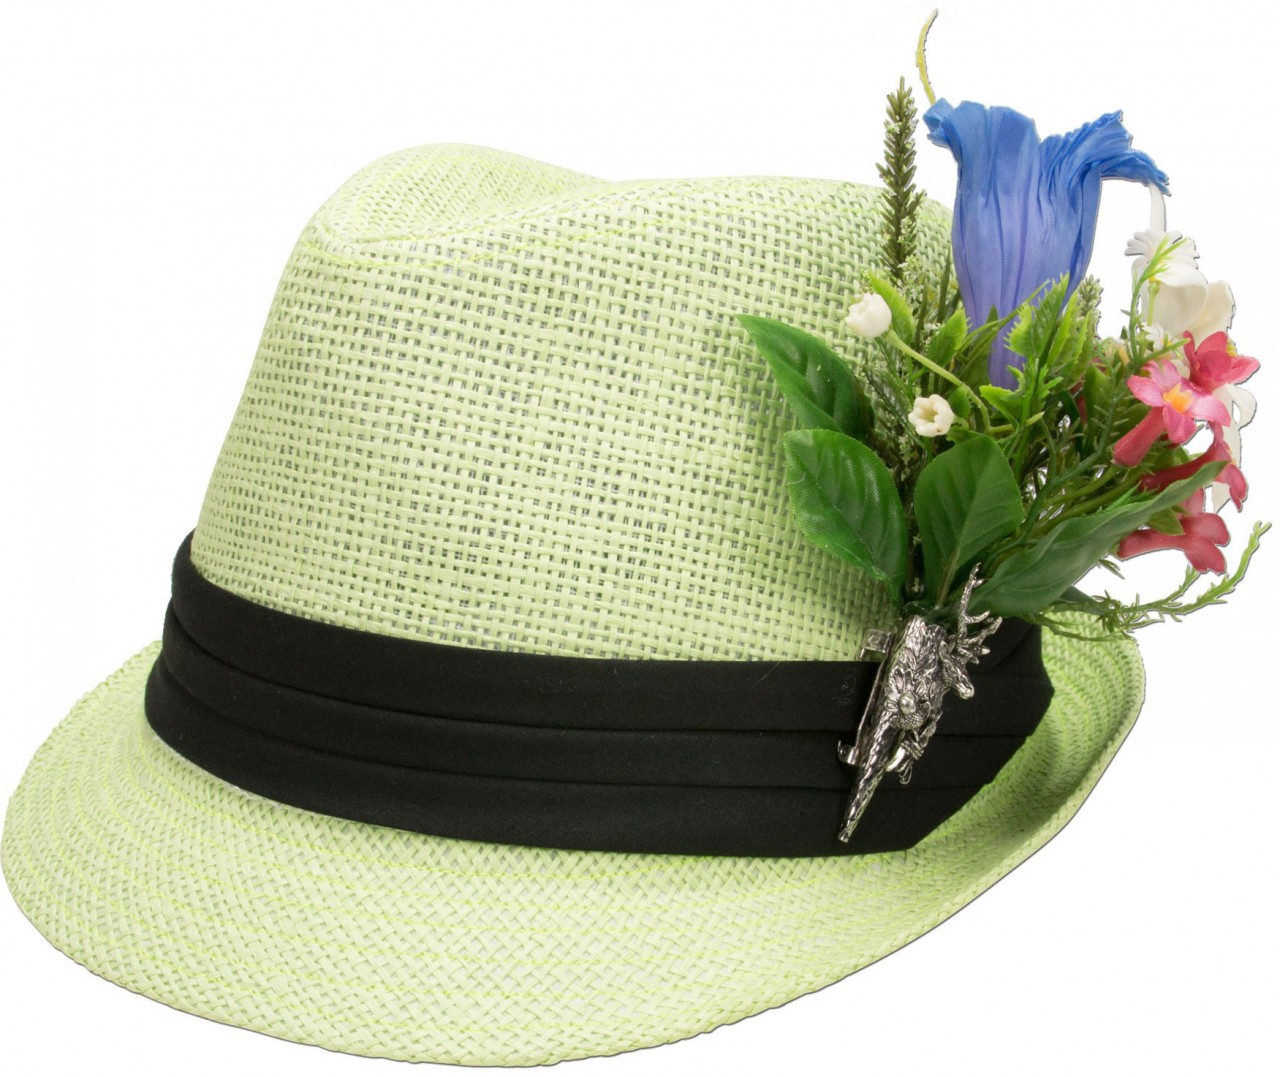 Strohhut Alpenblümchen hellgrün